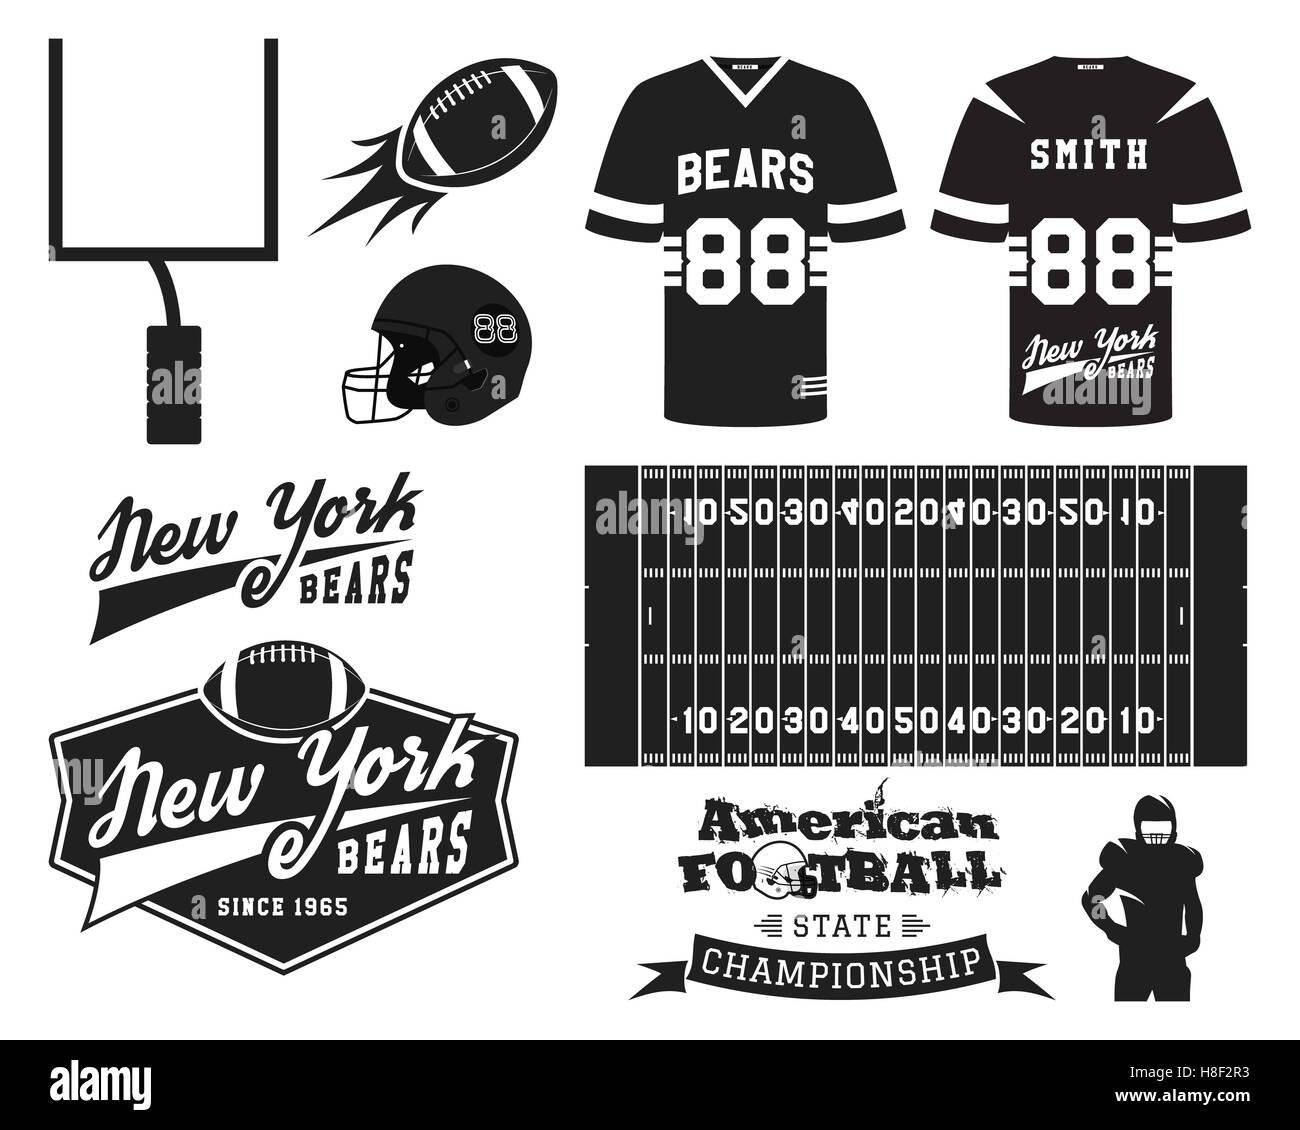 American football uniform, t-shirt design with team logo, label